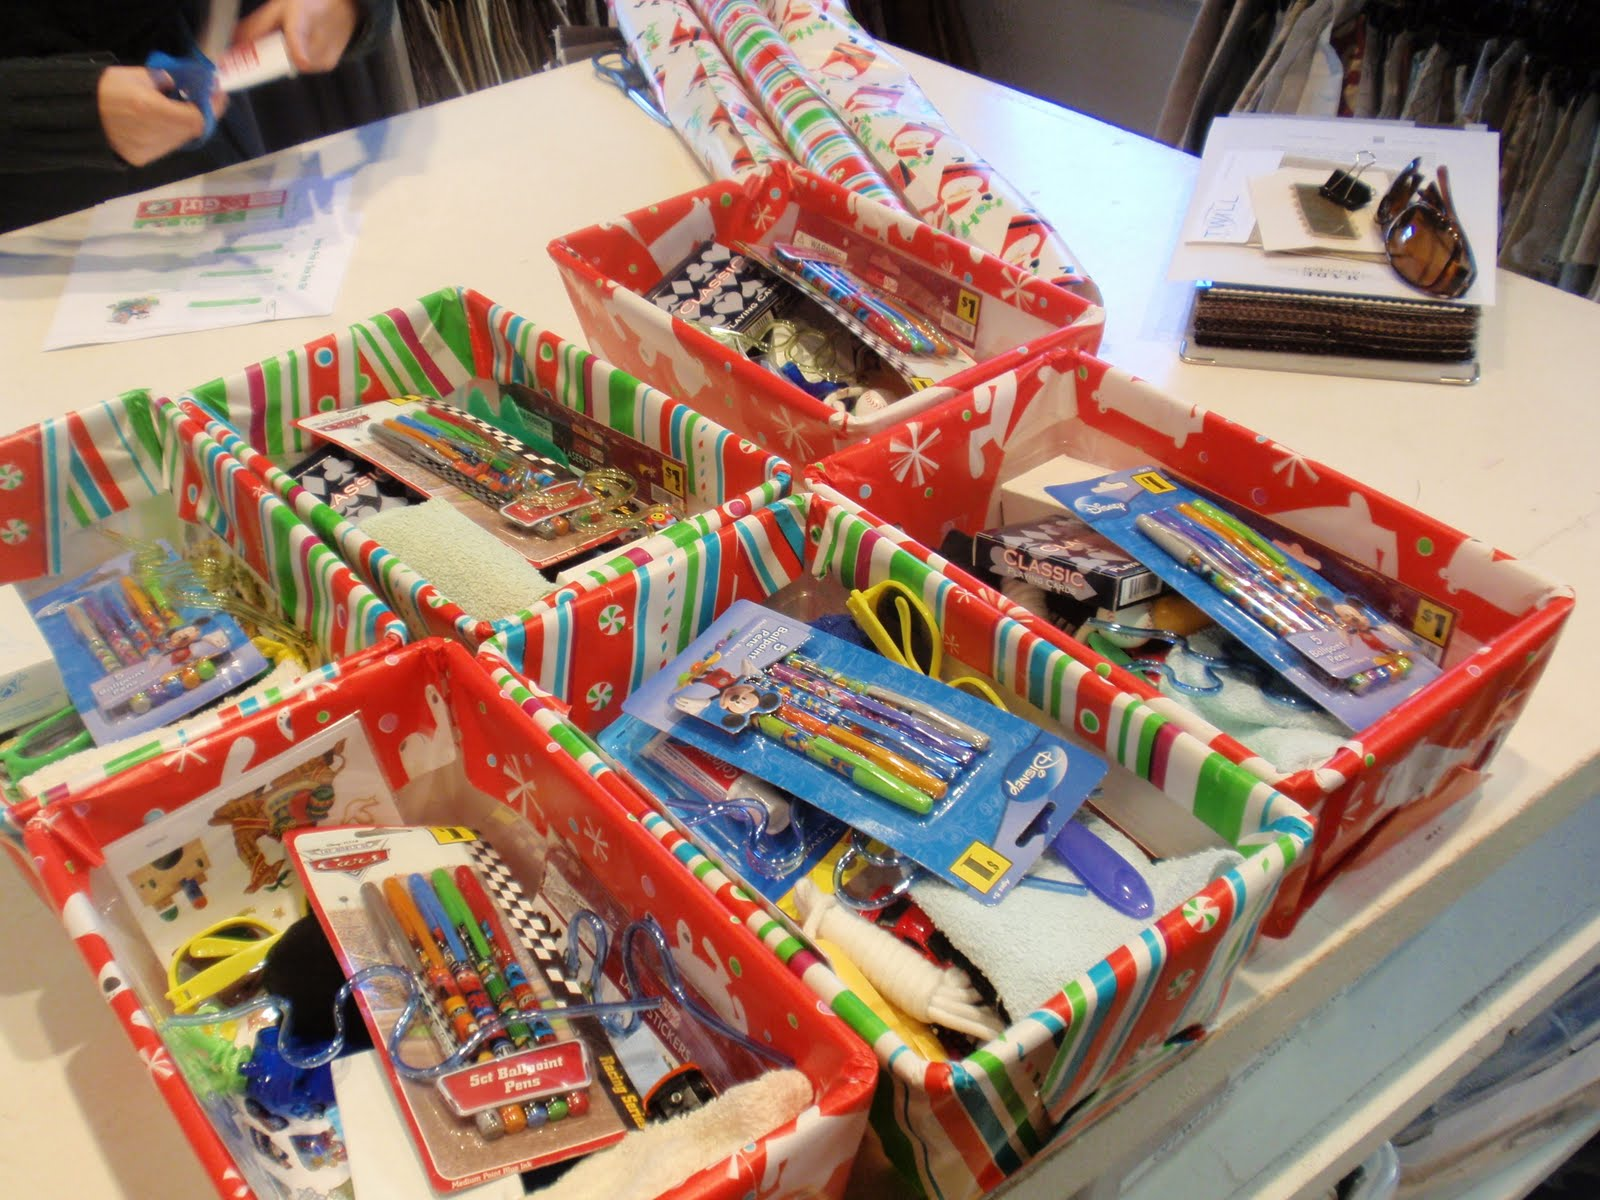 Operation Christmas Child Shoebox Display.Operation Christmas Child Shoebox Ideas Examples And Forms